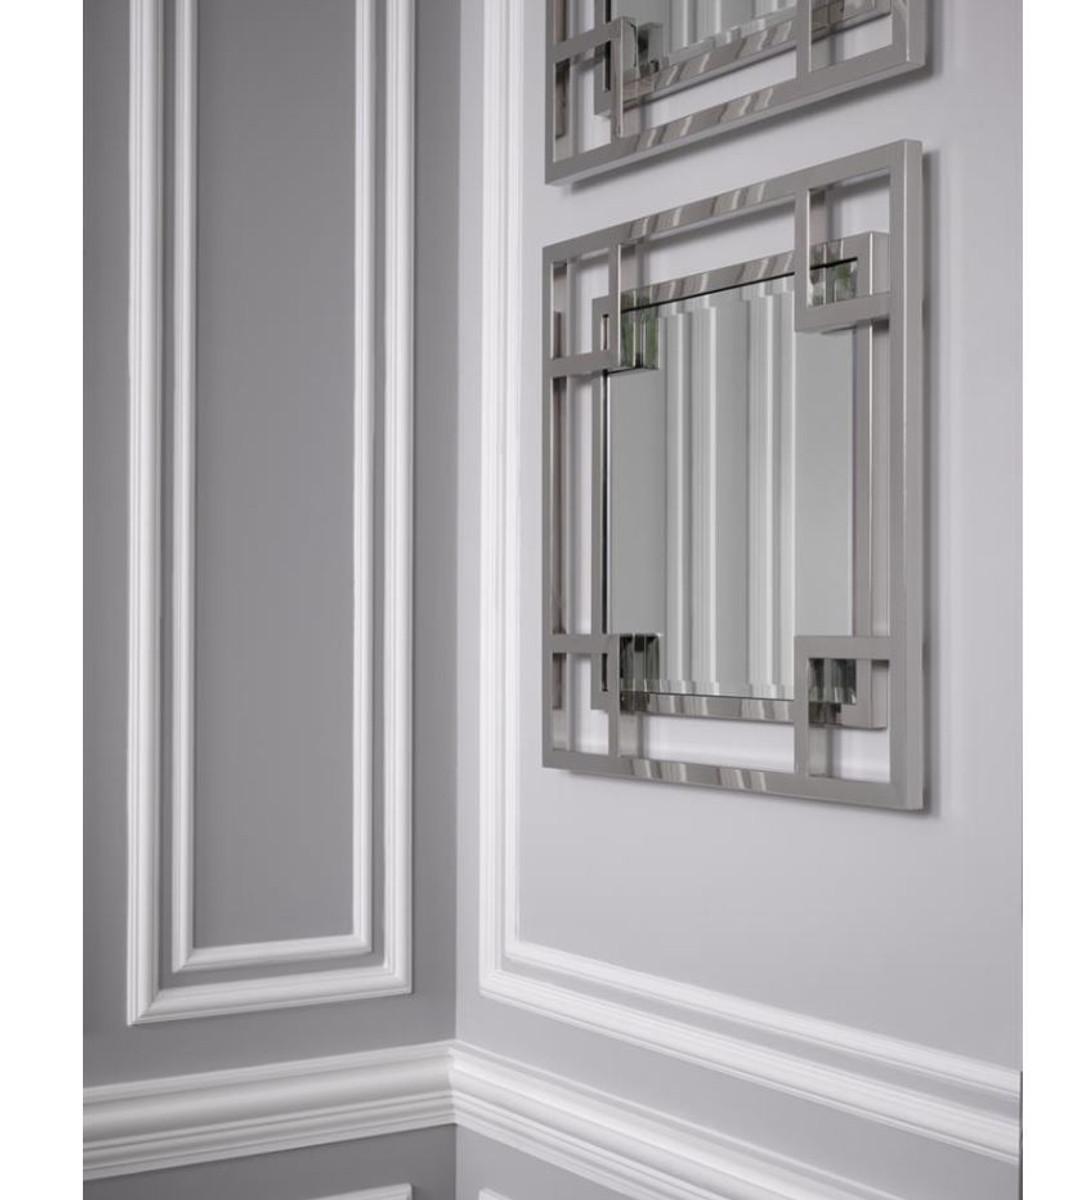 casa padrino designer wandspiegel silber 90 x h 90 cm luxus spiegel spiegel luxus spiegel. Black Bedroom Furniture Sets. Home Design Ideas